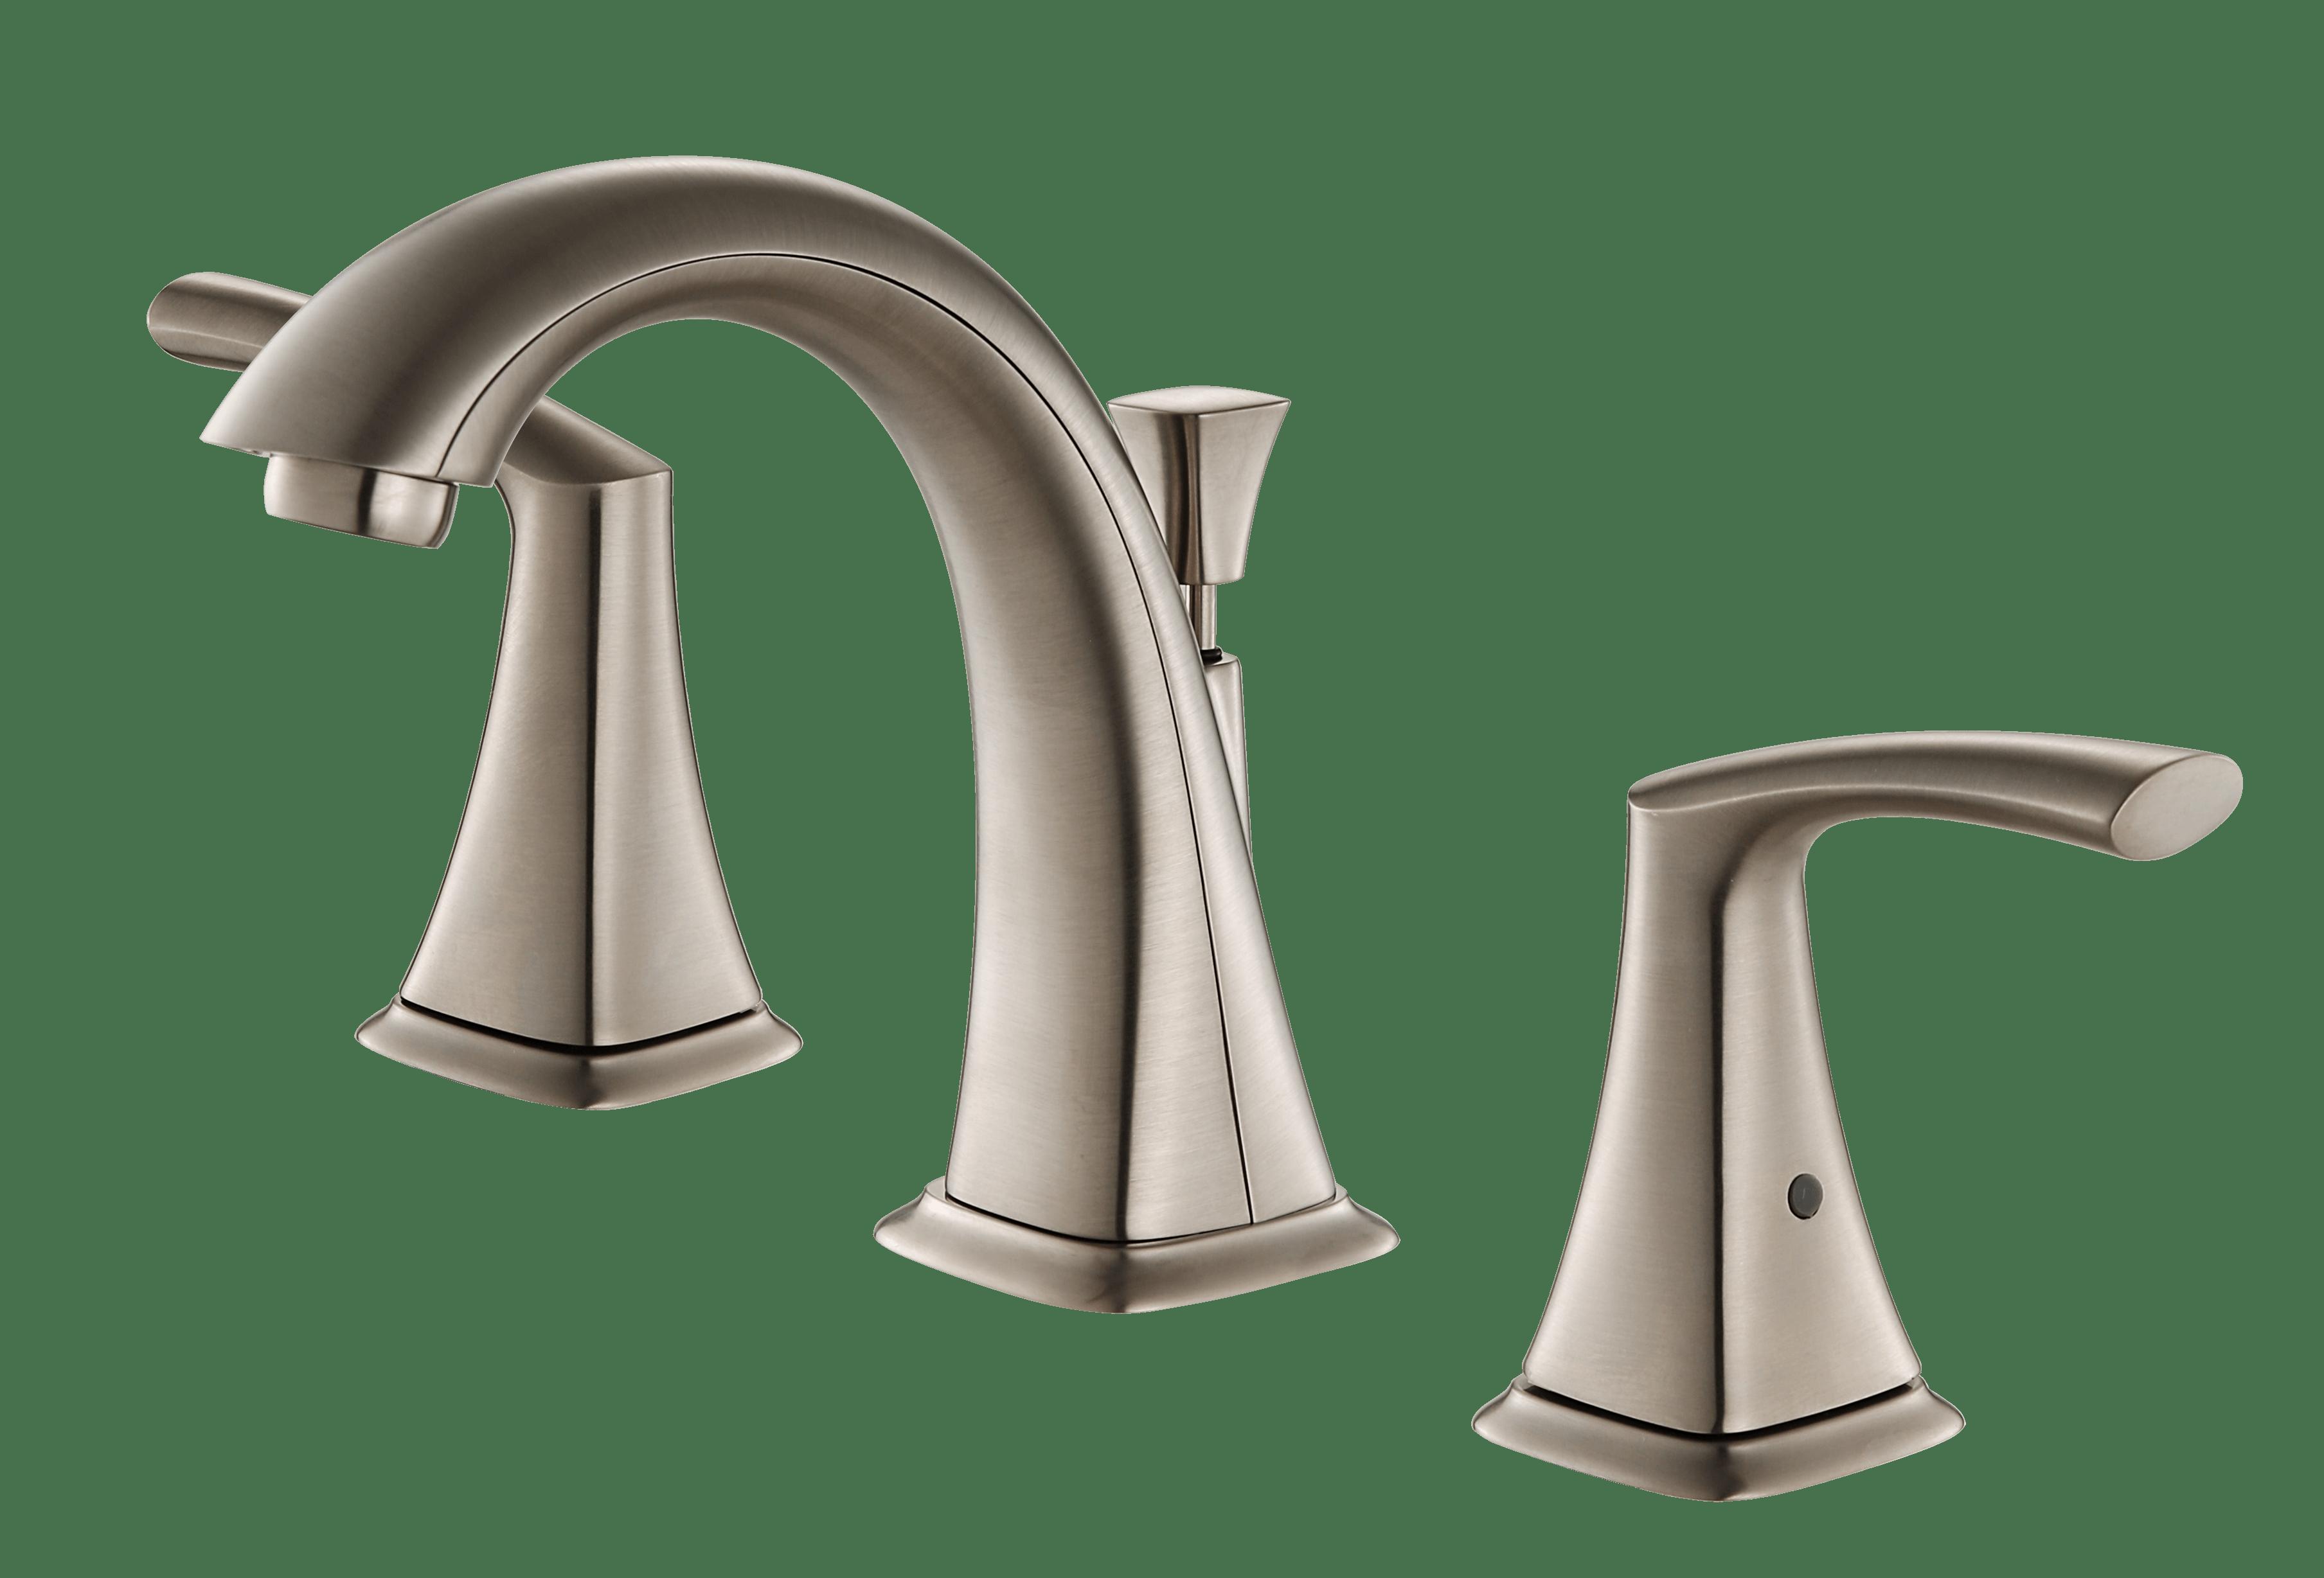 Dual Levers Bathroom Faucet 0